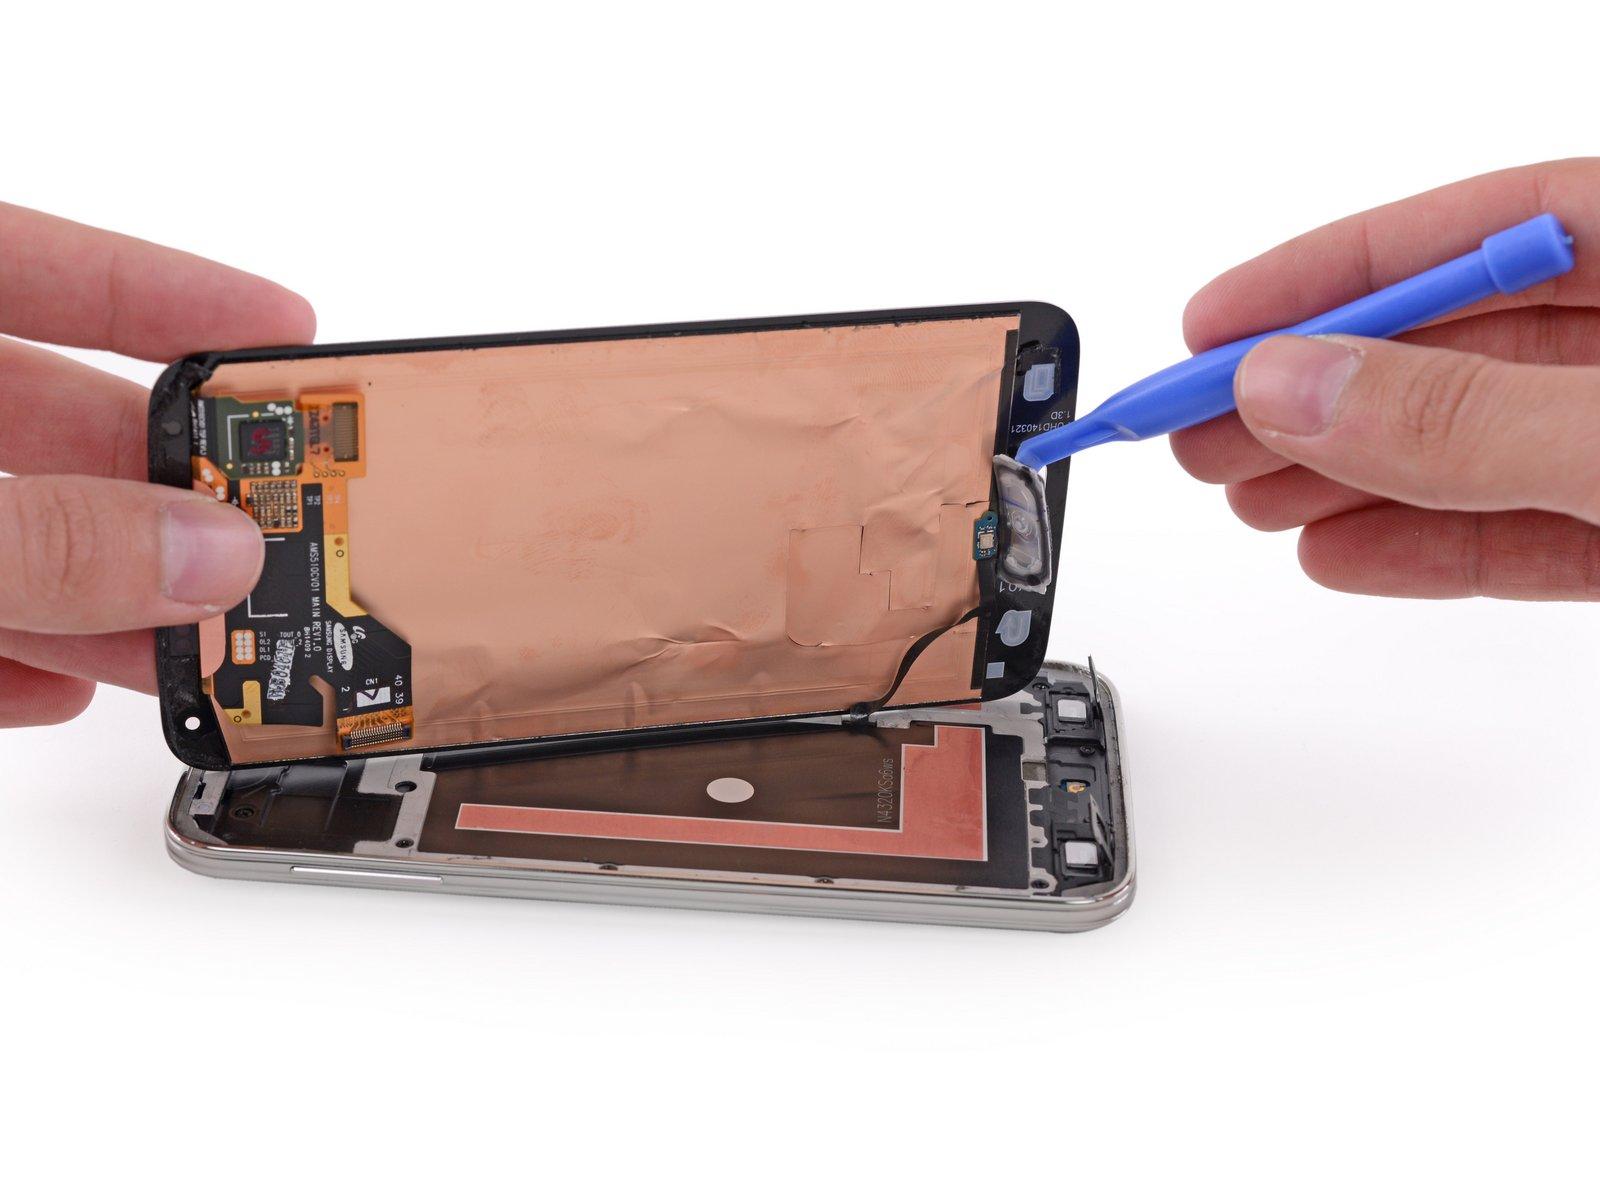 Samsung Galaxy S5 Teardown - iFixit